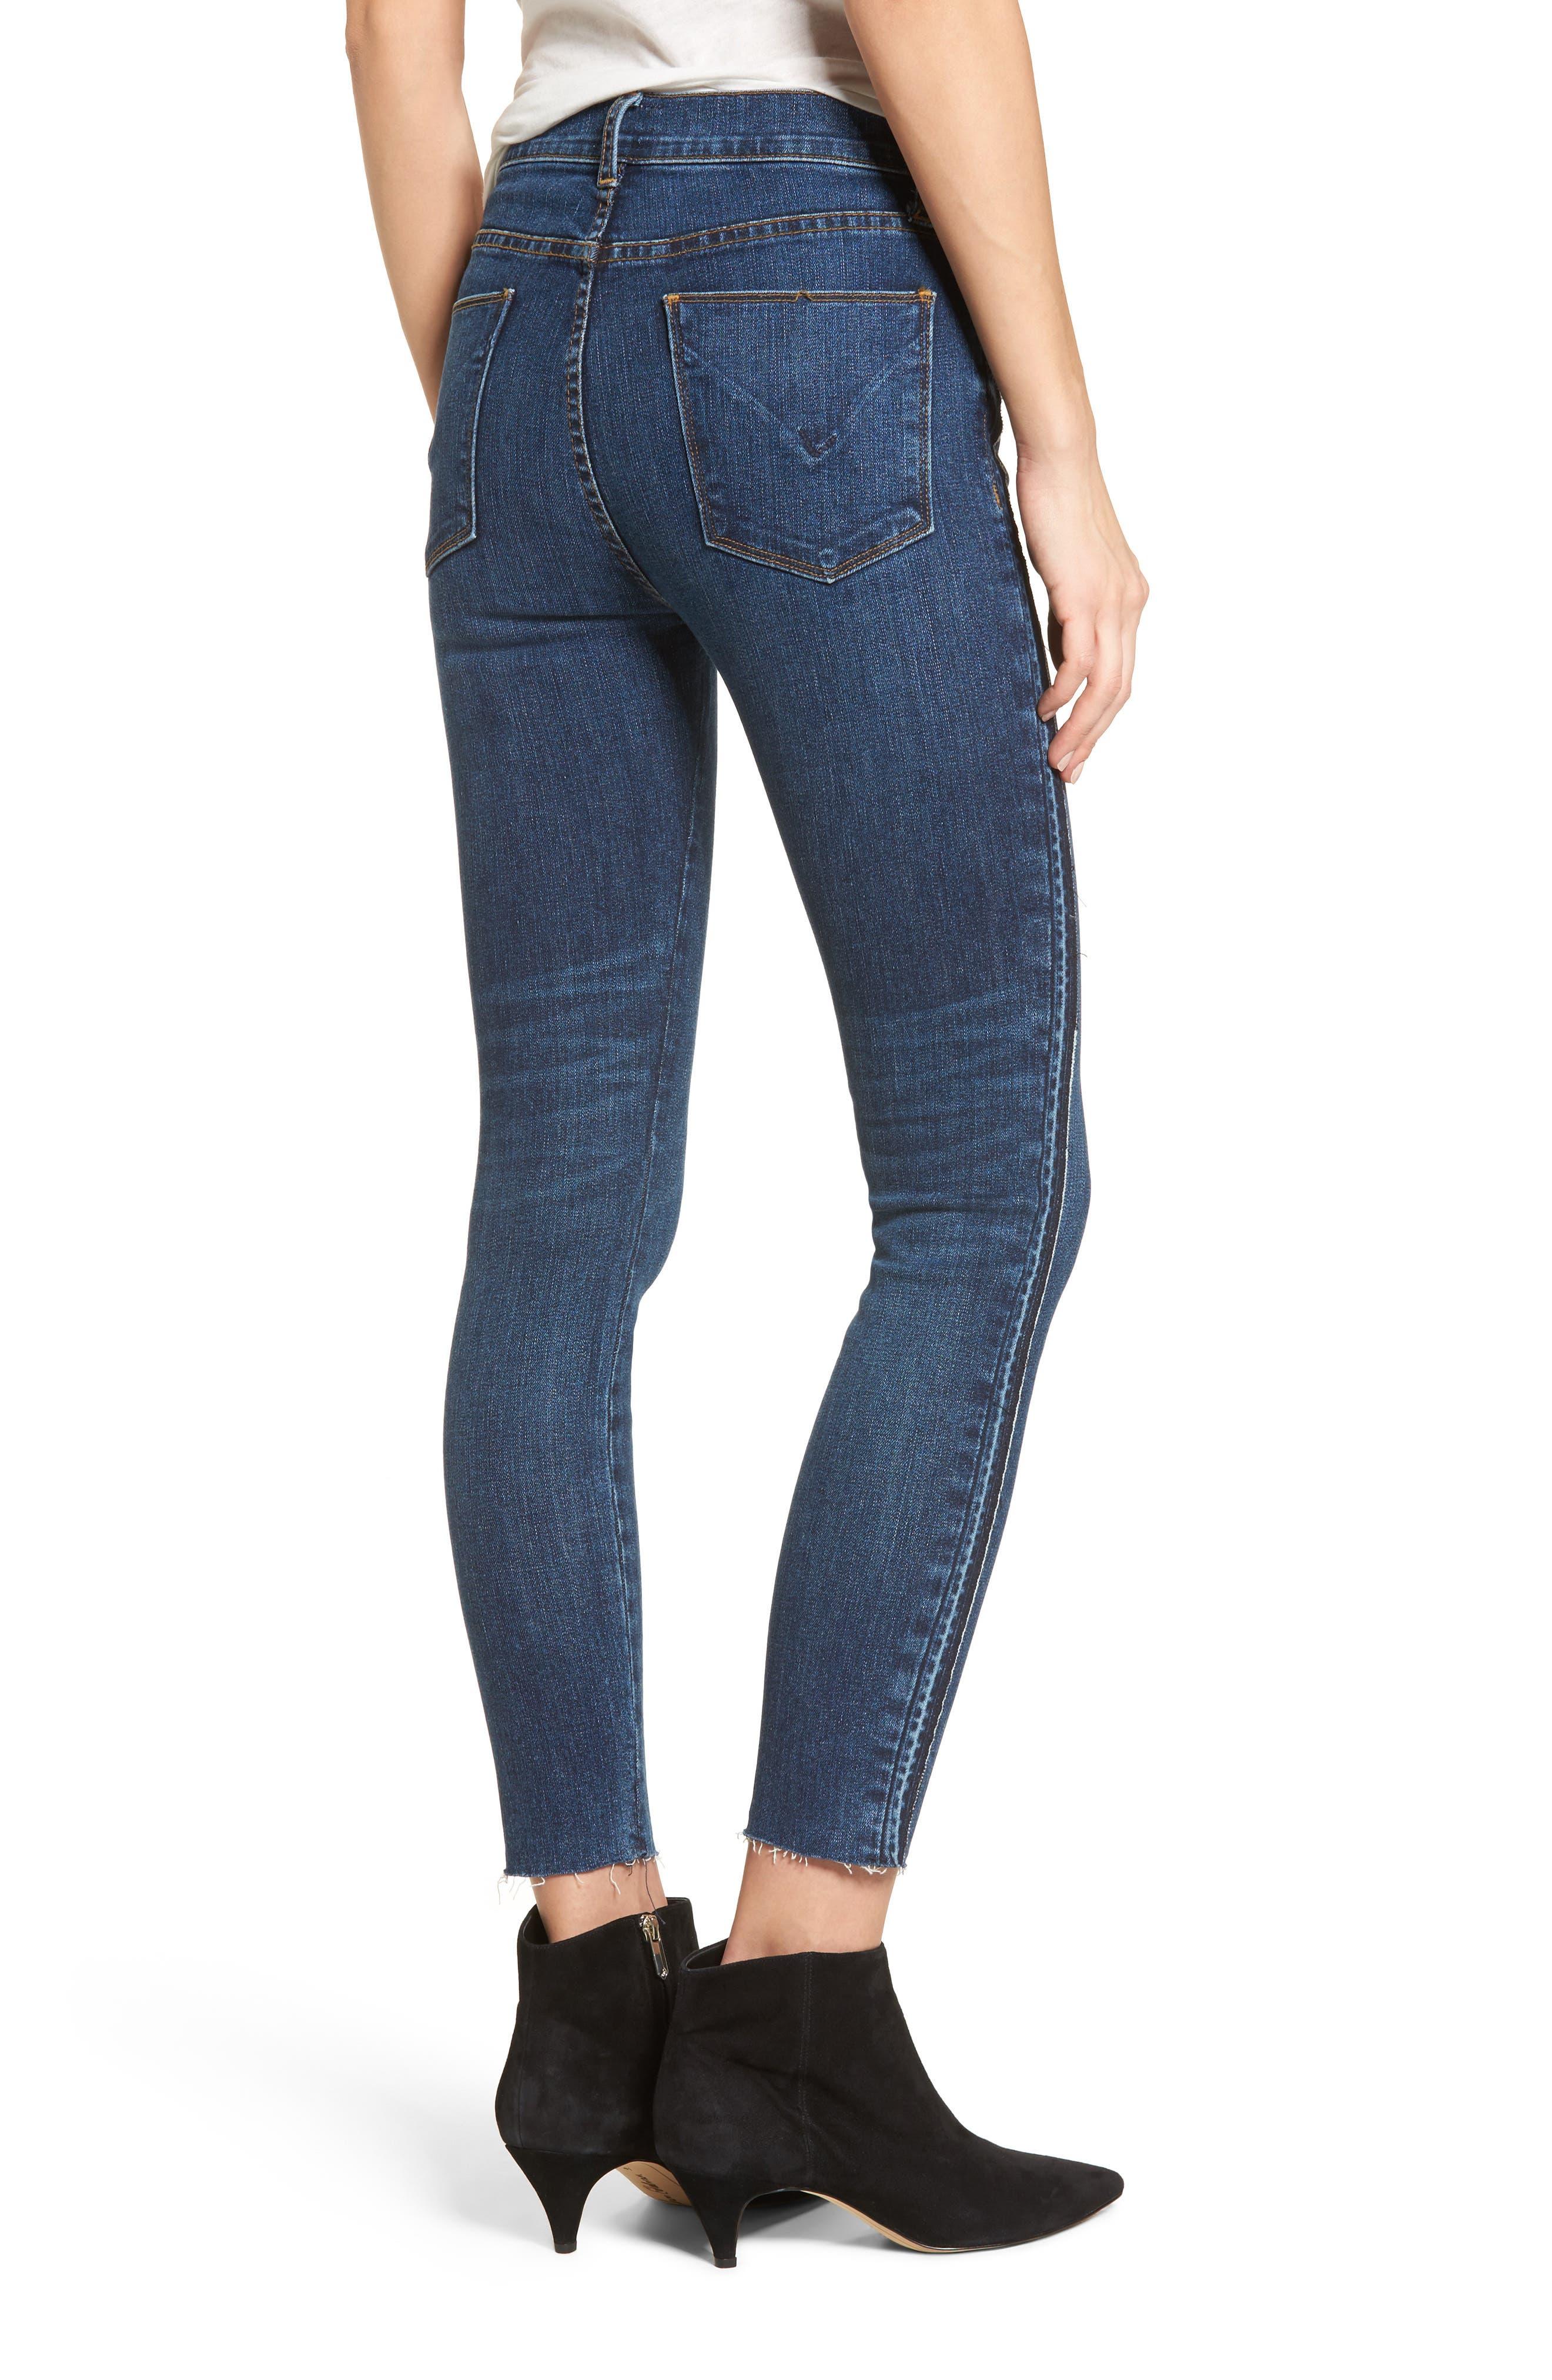 Barbara High Waist Super Skinny Jeans,                             Alternate thumbnail 2, color,                             Fatal